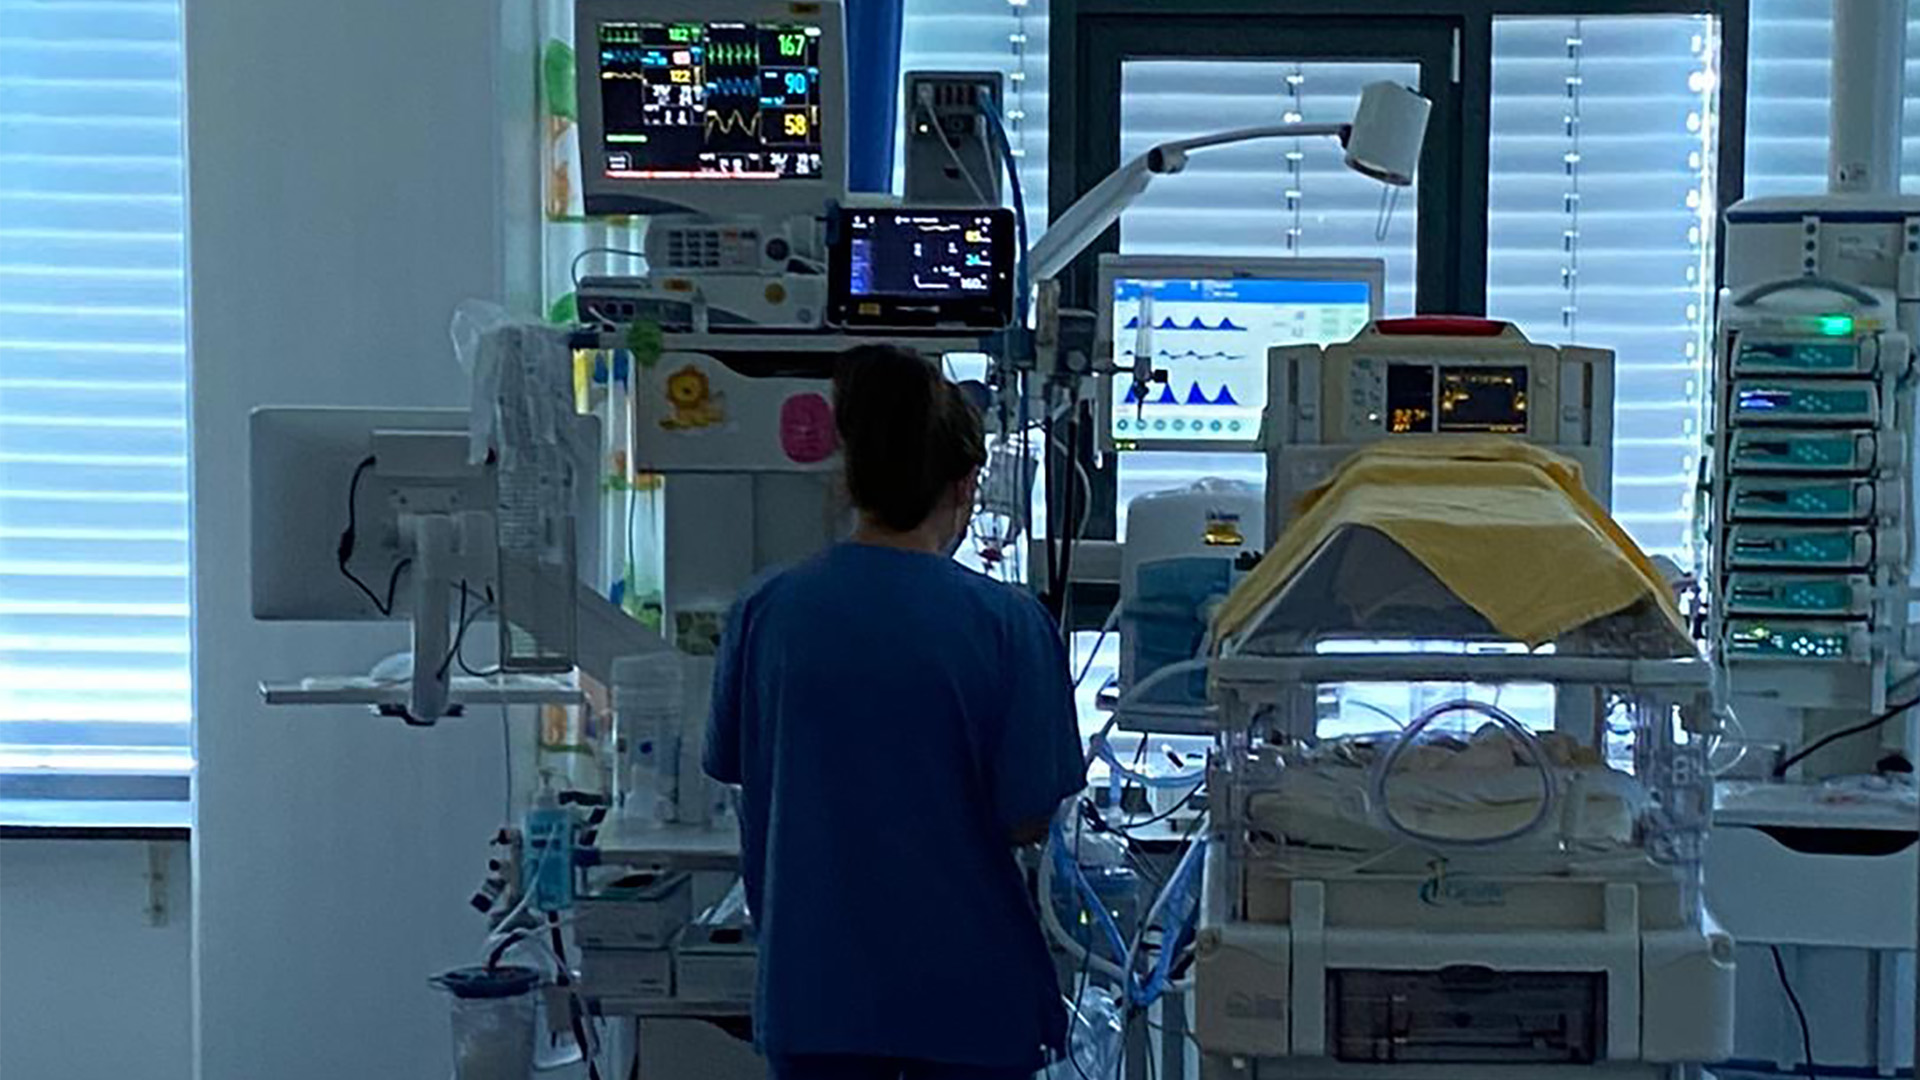 20kw35_Krankenhaus_04